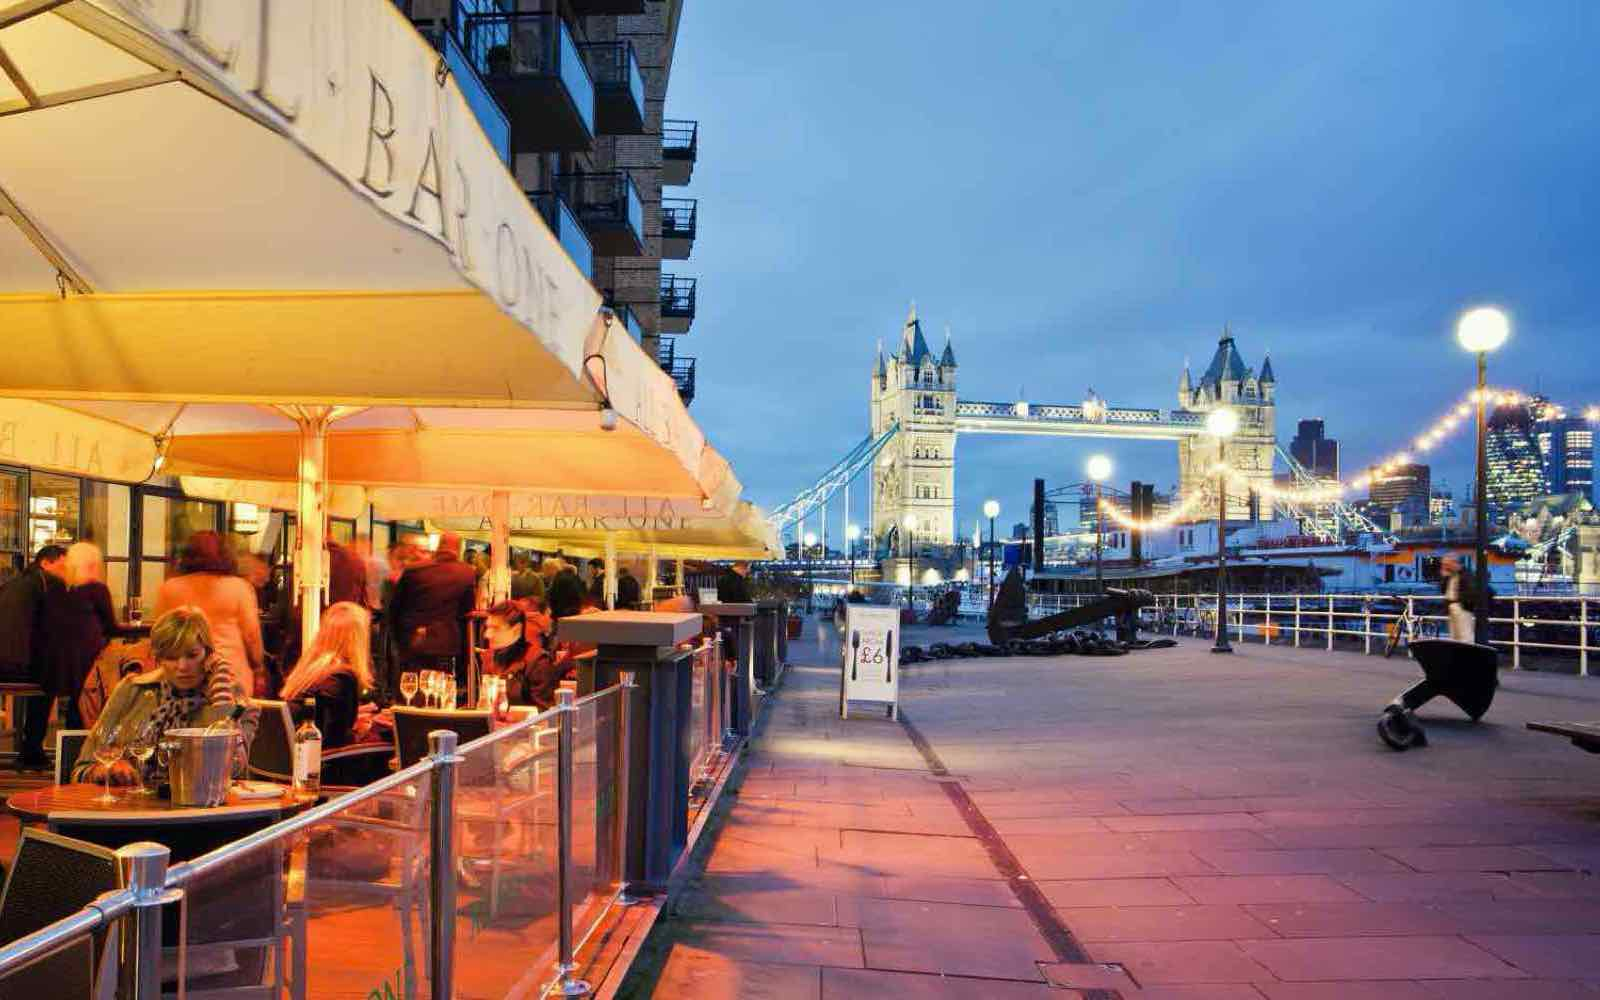 The Tower Bridge promenade